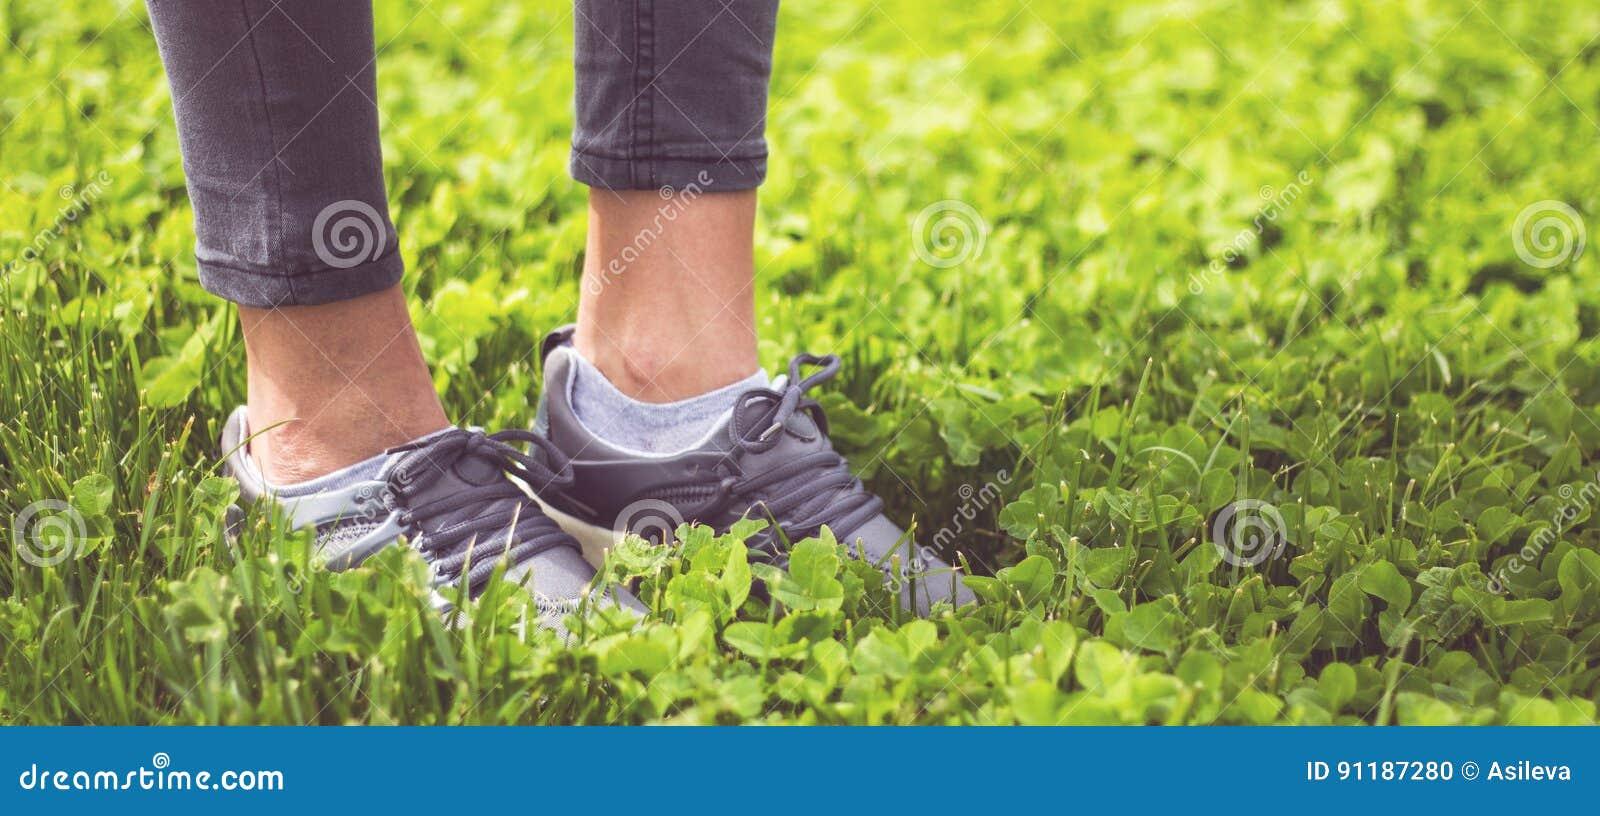 Füße Des Jungen Mädchens Im Sport Beschuht Turnschuhe Auf